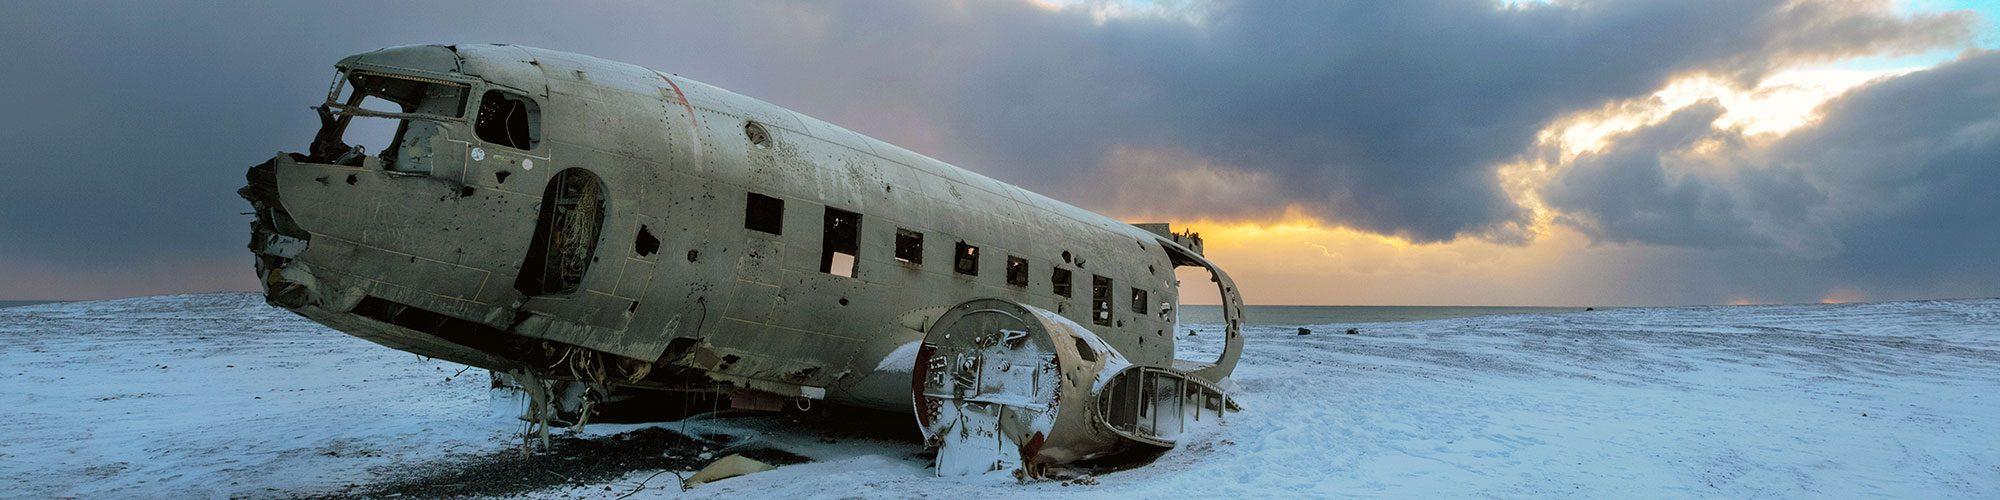 dc3-plane-wreck-iceland